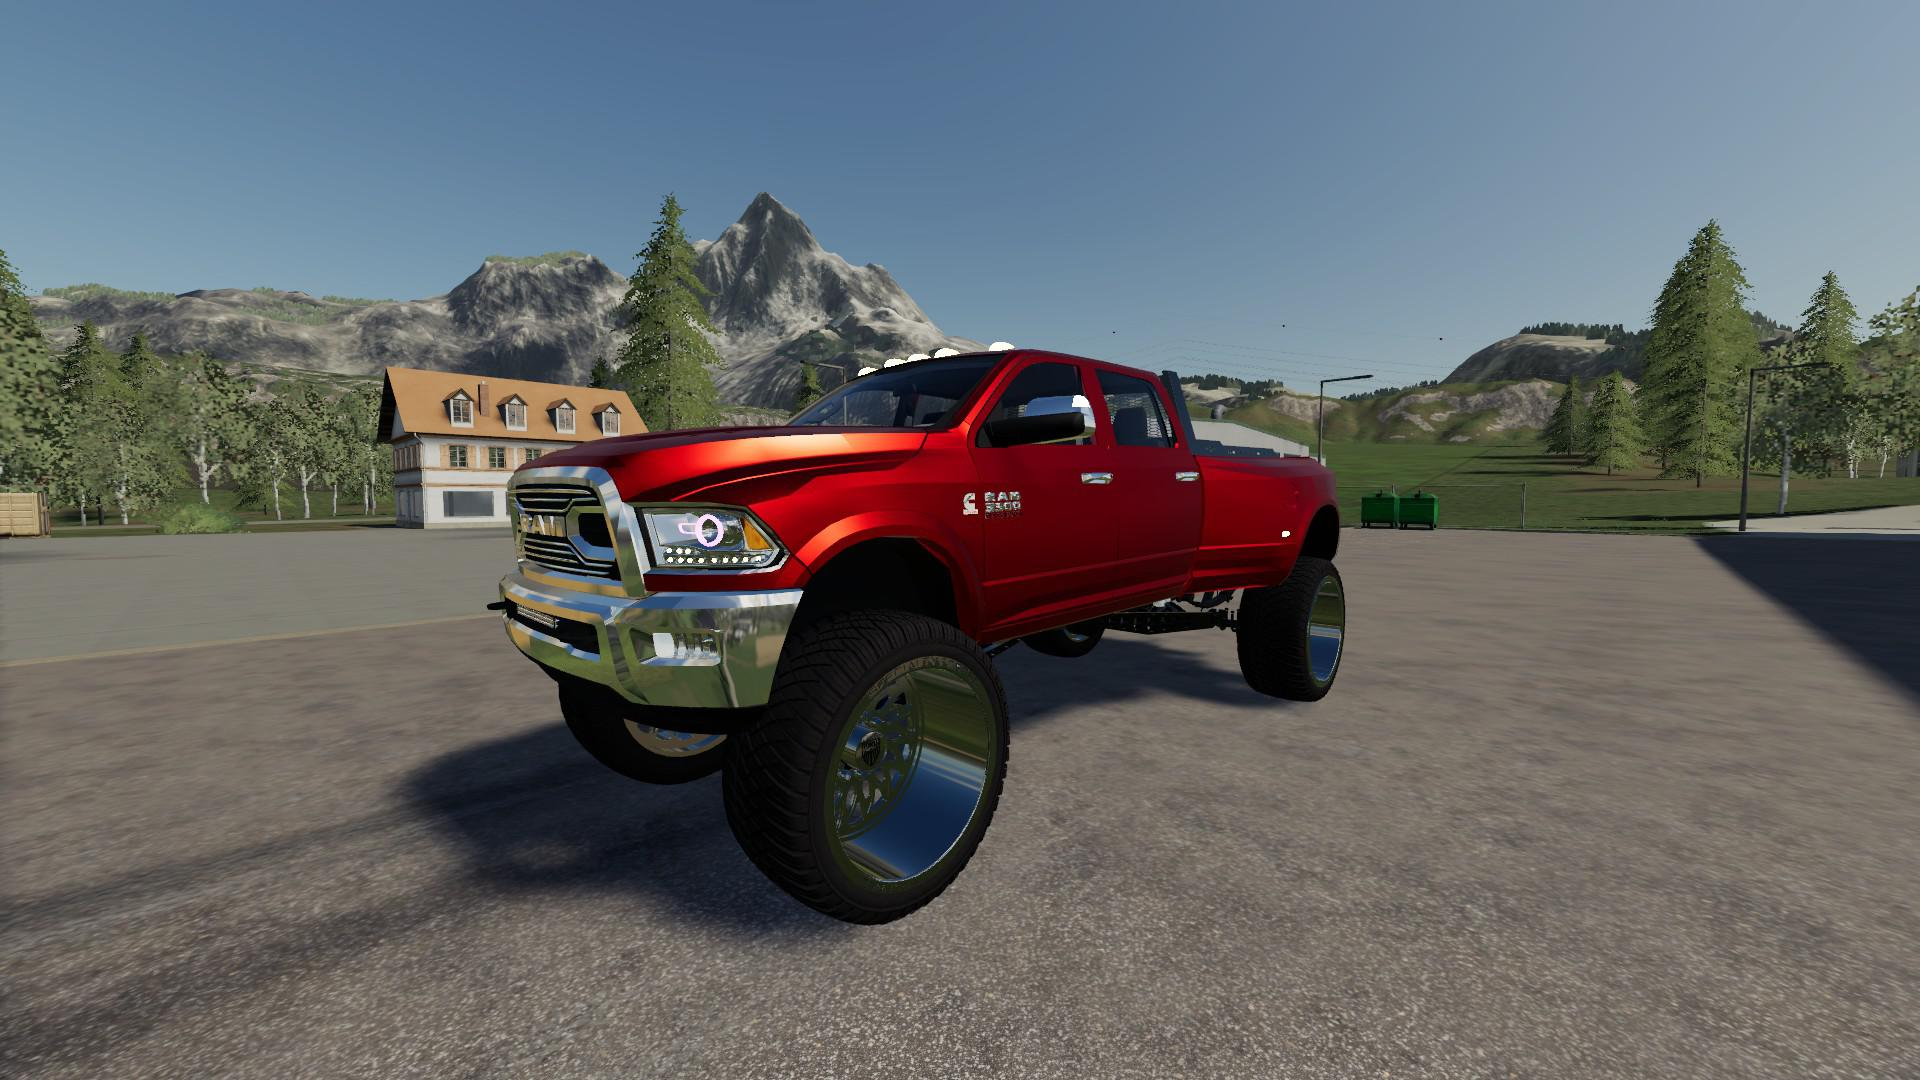 Dodge Ram 3500 Lifted V3 0 Fs19 Farming Simulator 19 Mod Fs19 Mod